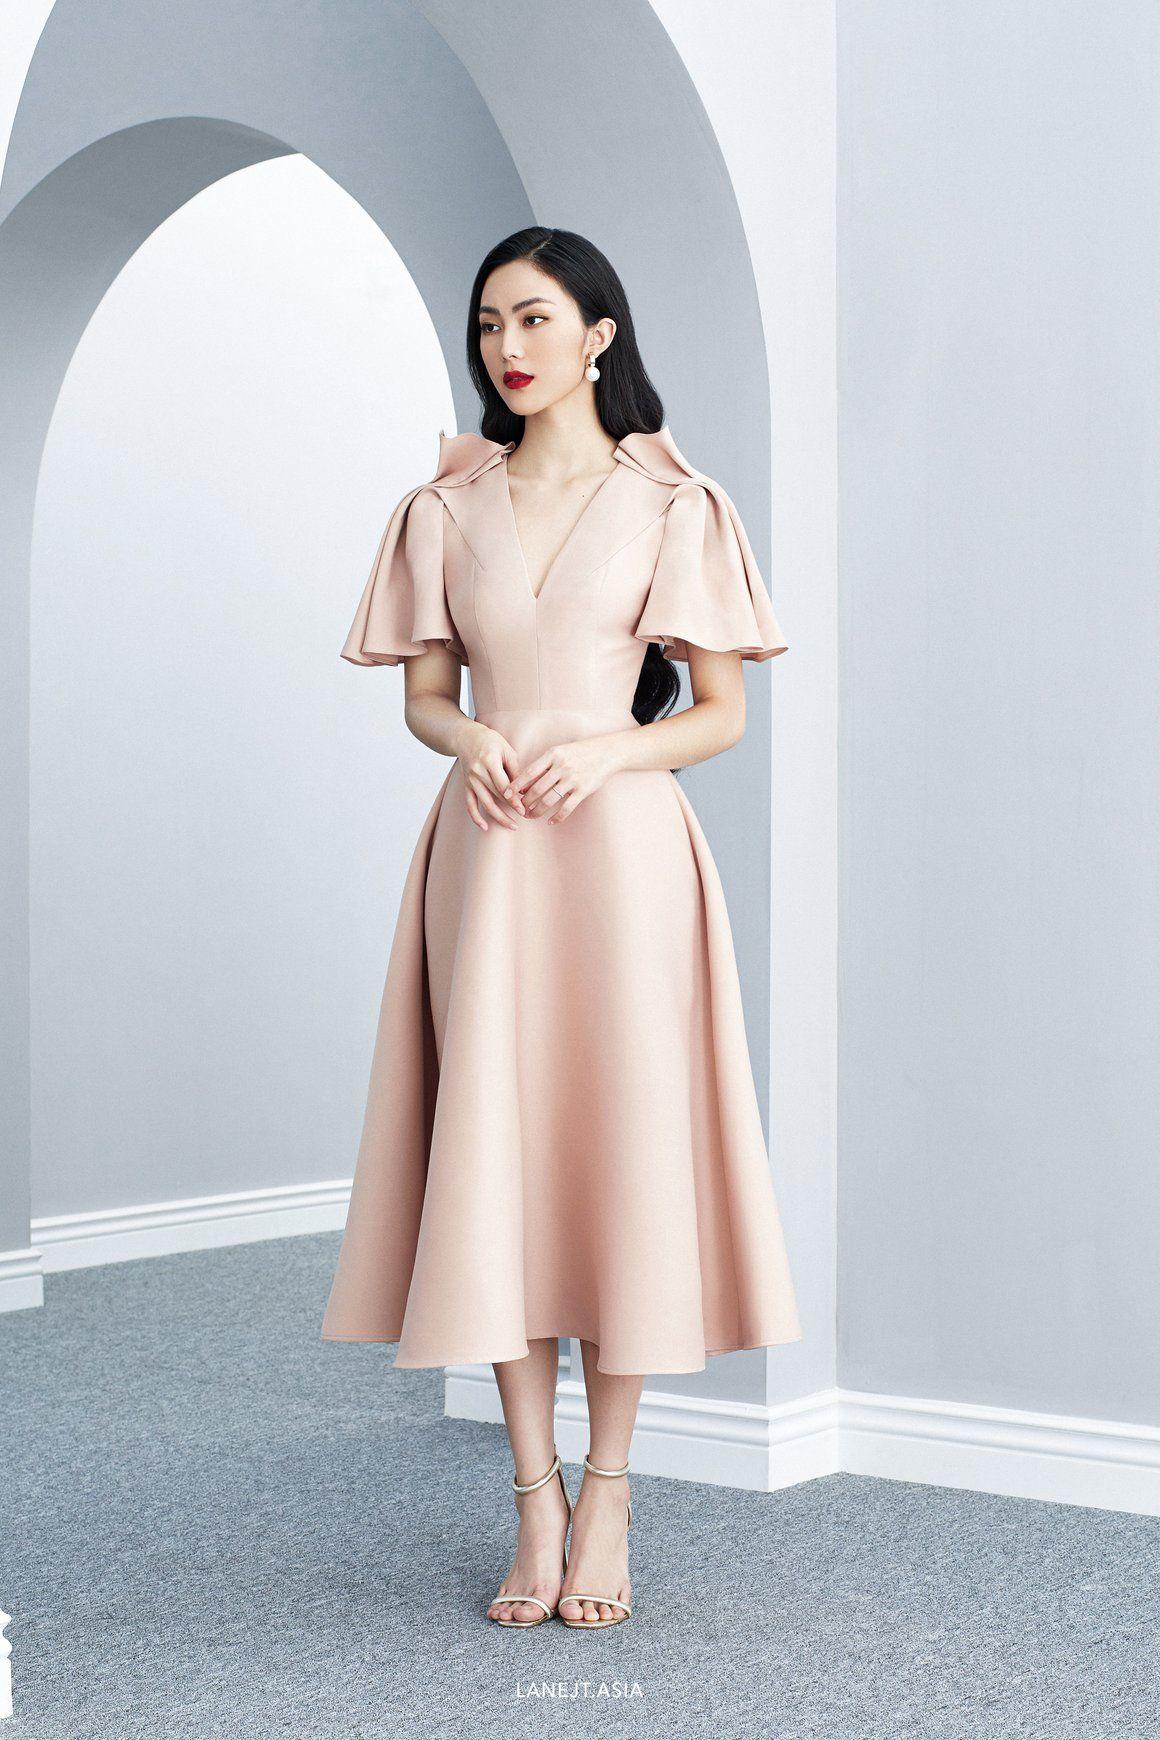 raphaelle pleated shoulder midi dress - lane jt | pakaian